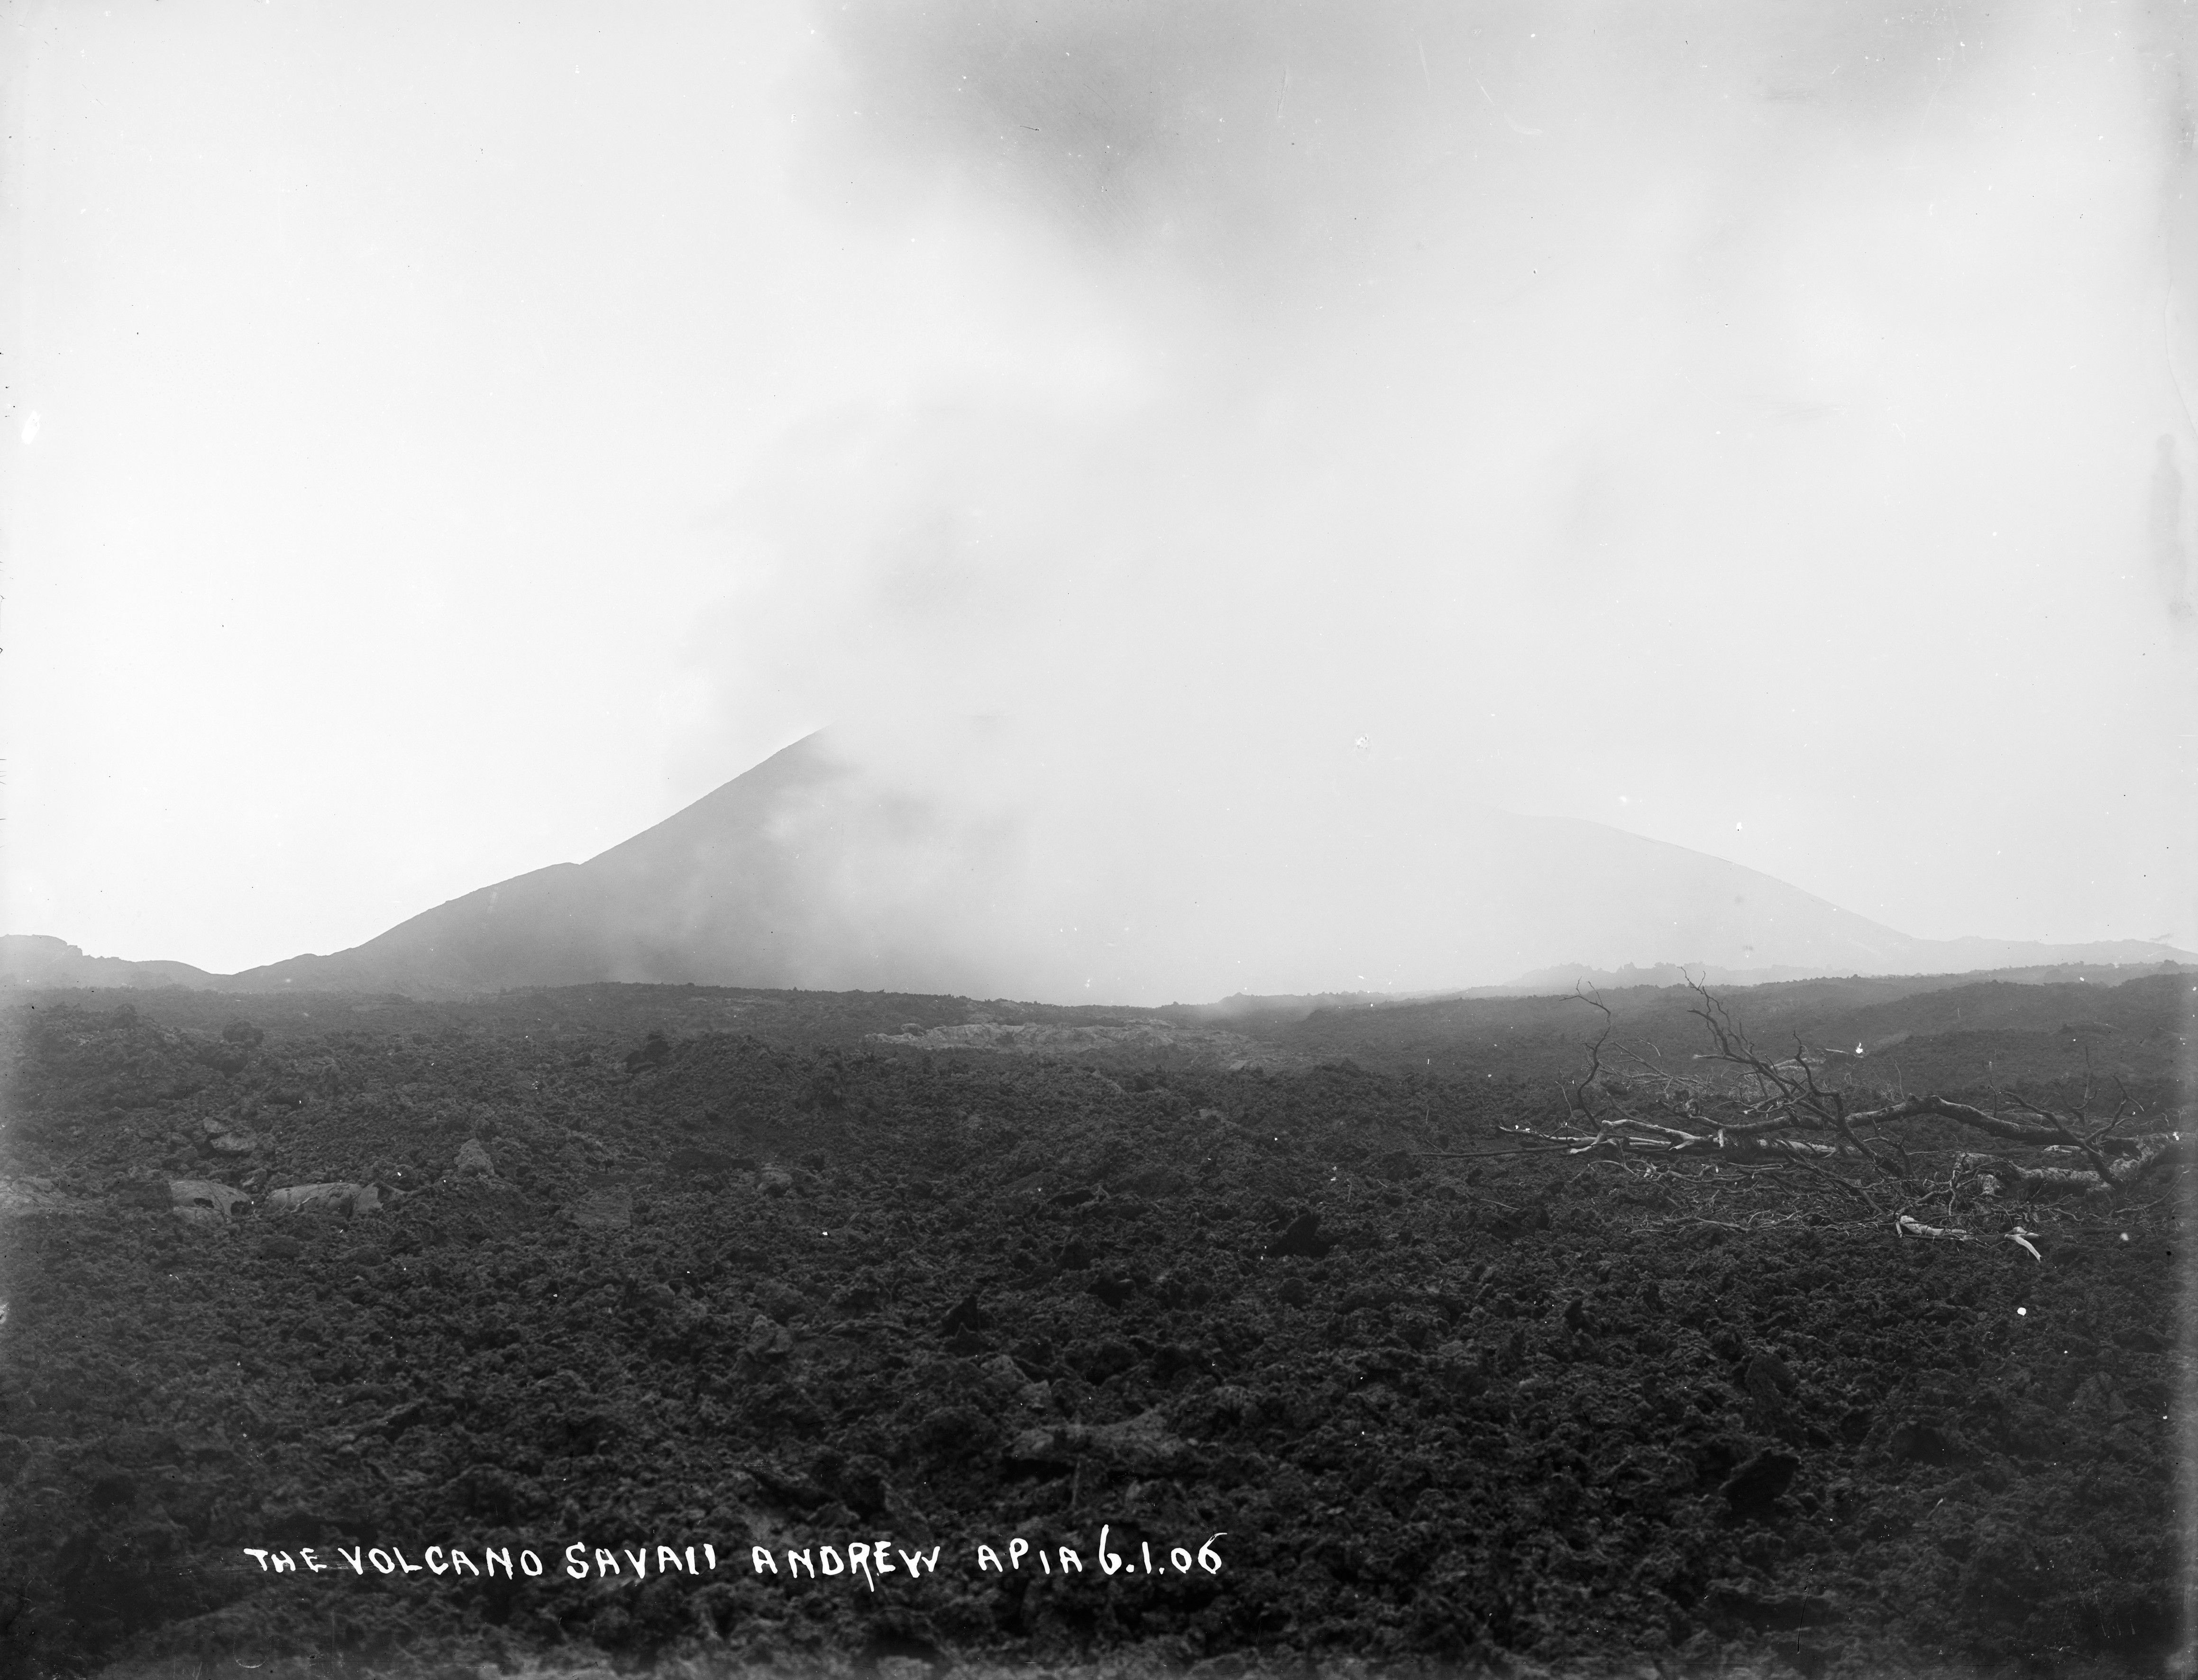 Volcano,Savaii.(.Photographer's.Title).Andrew.Thomas 1906.jpg